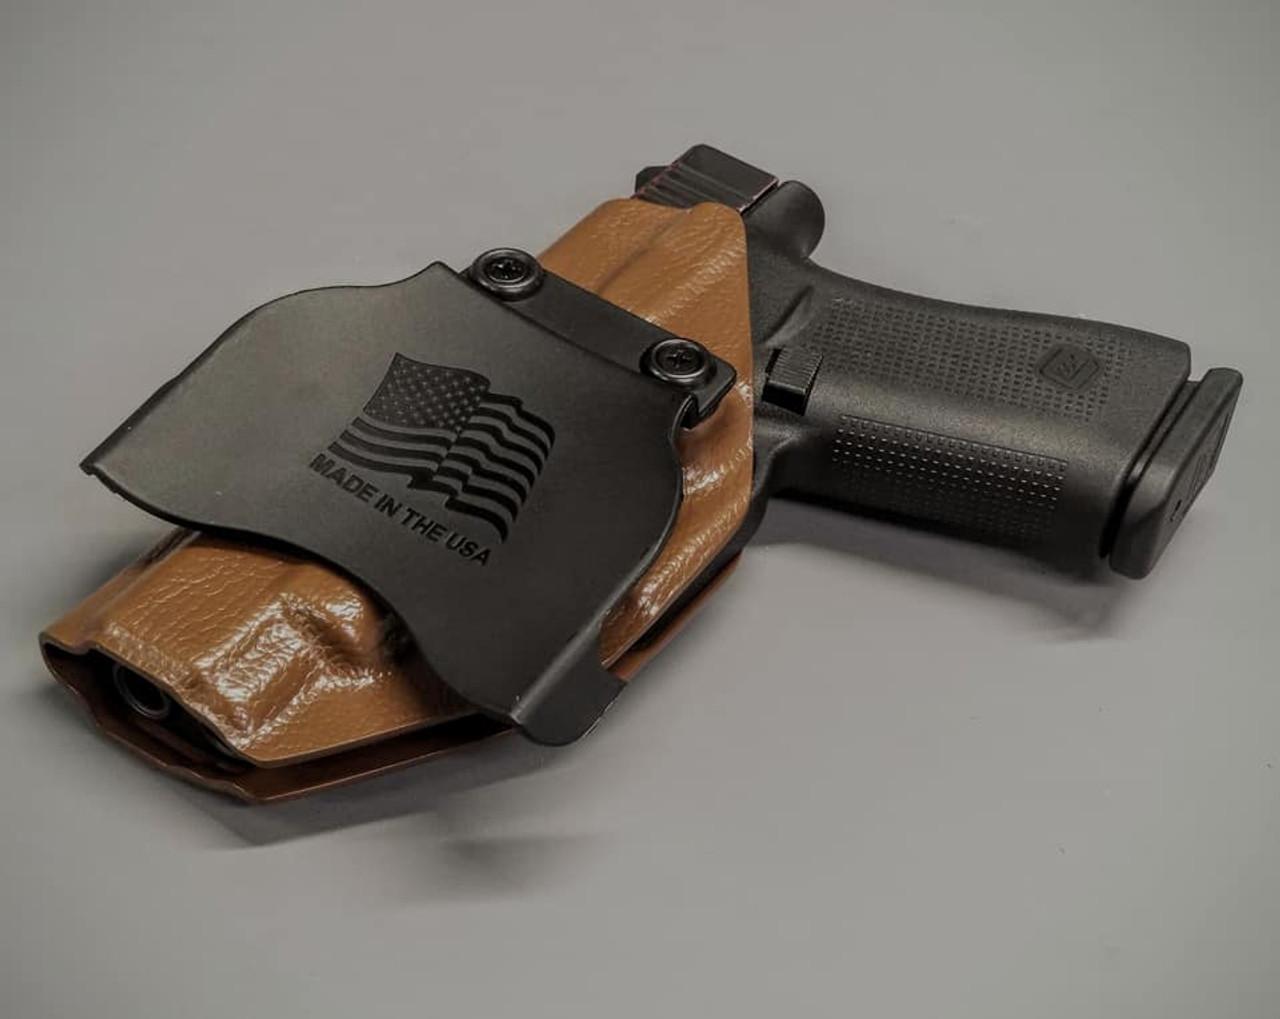 Glock 48 Paddle Holster